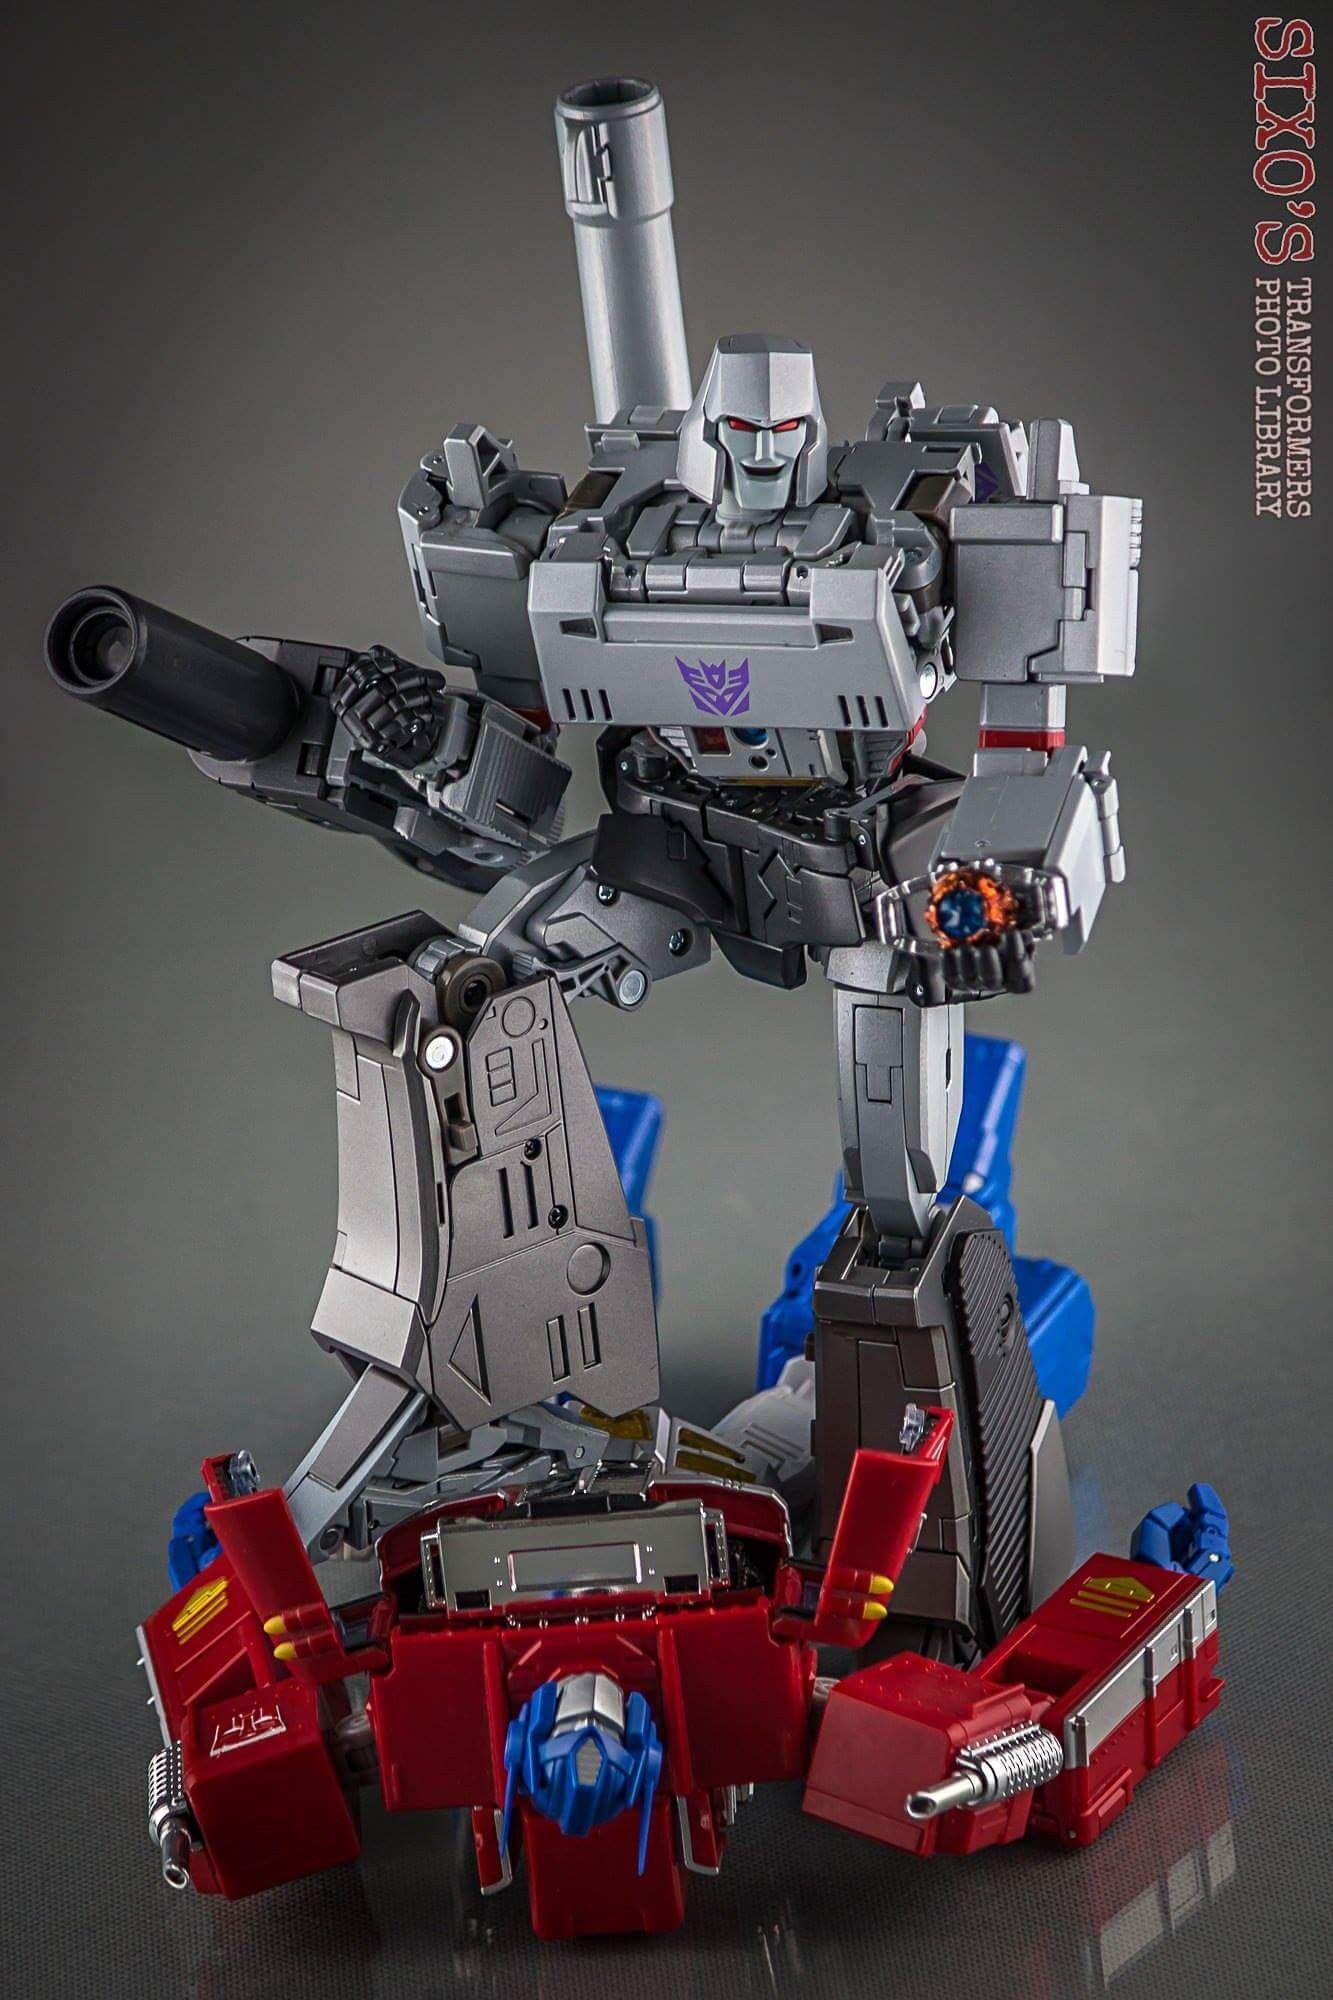 Megatron Vs Optimus Prime Transformers Masterpiece Transformers Transformers Collection